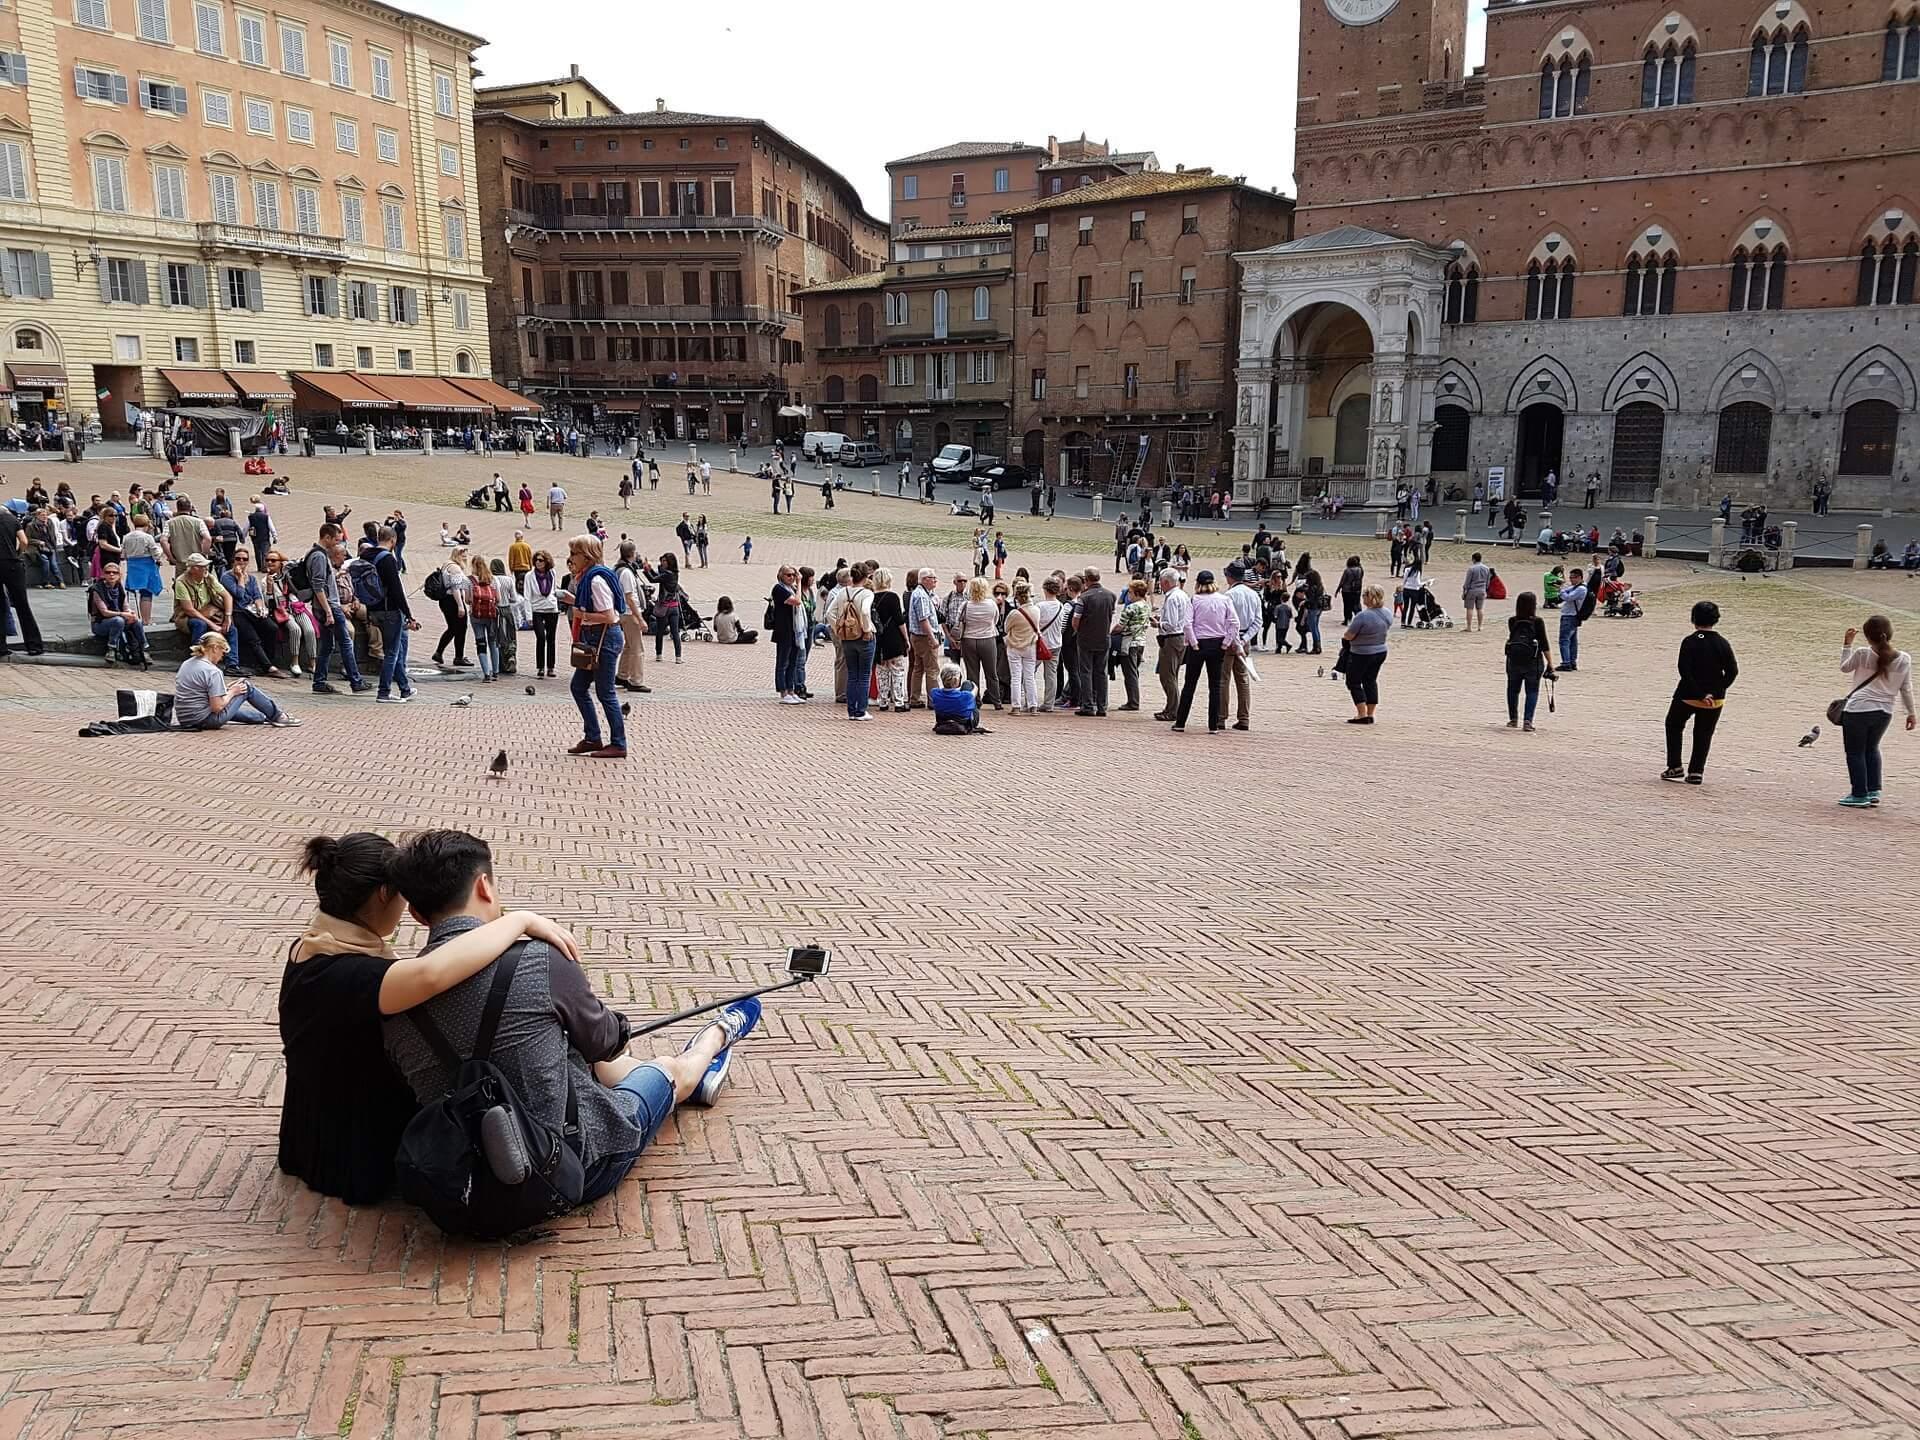 City Center, Siena